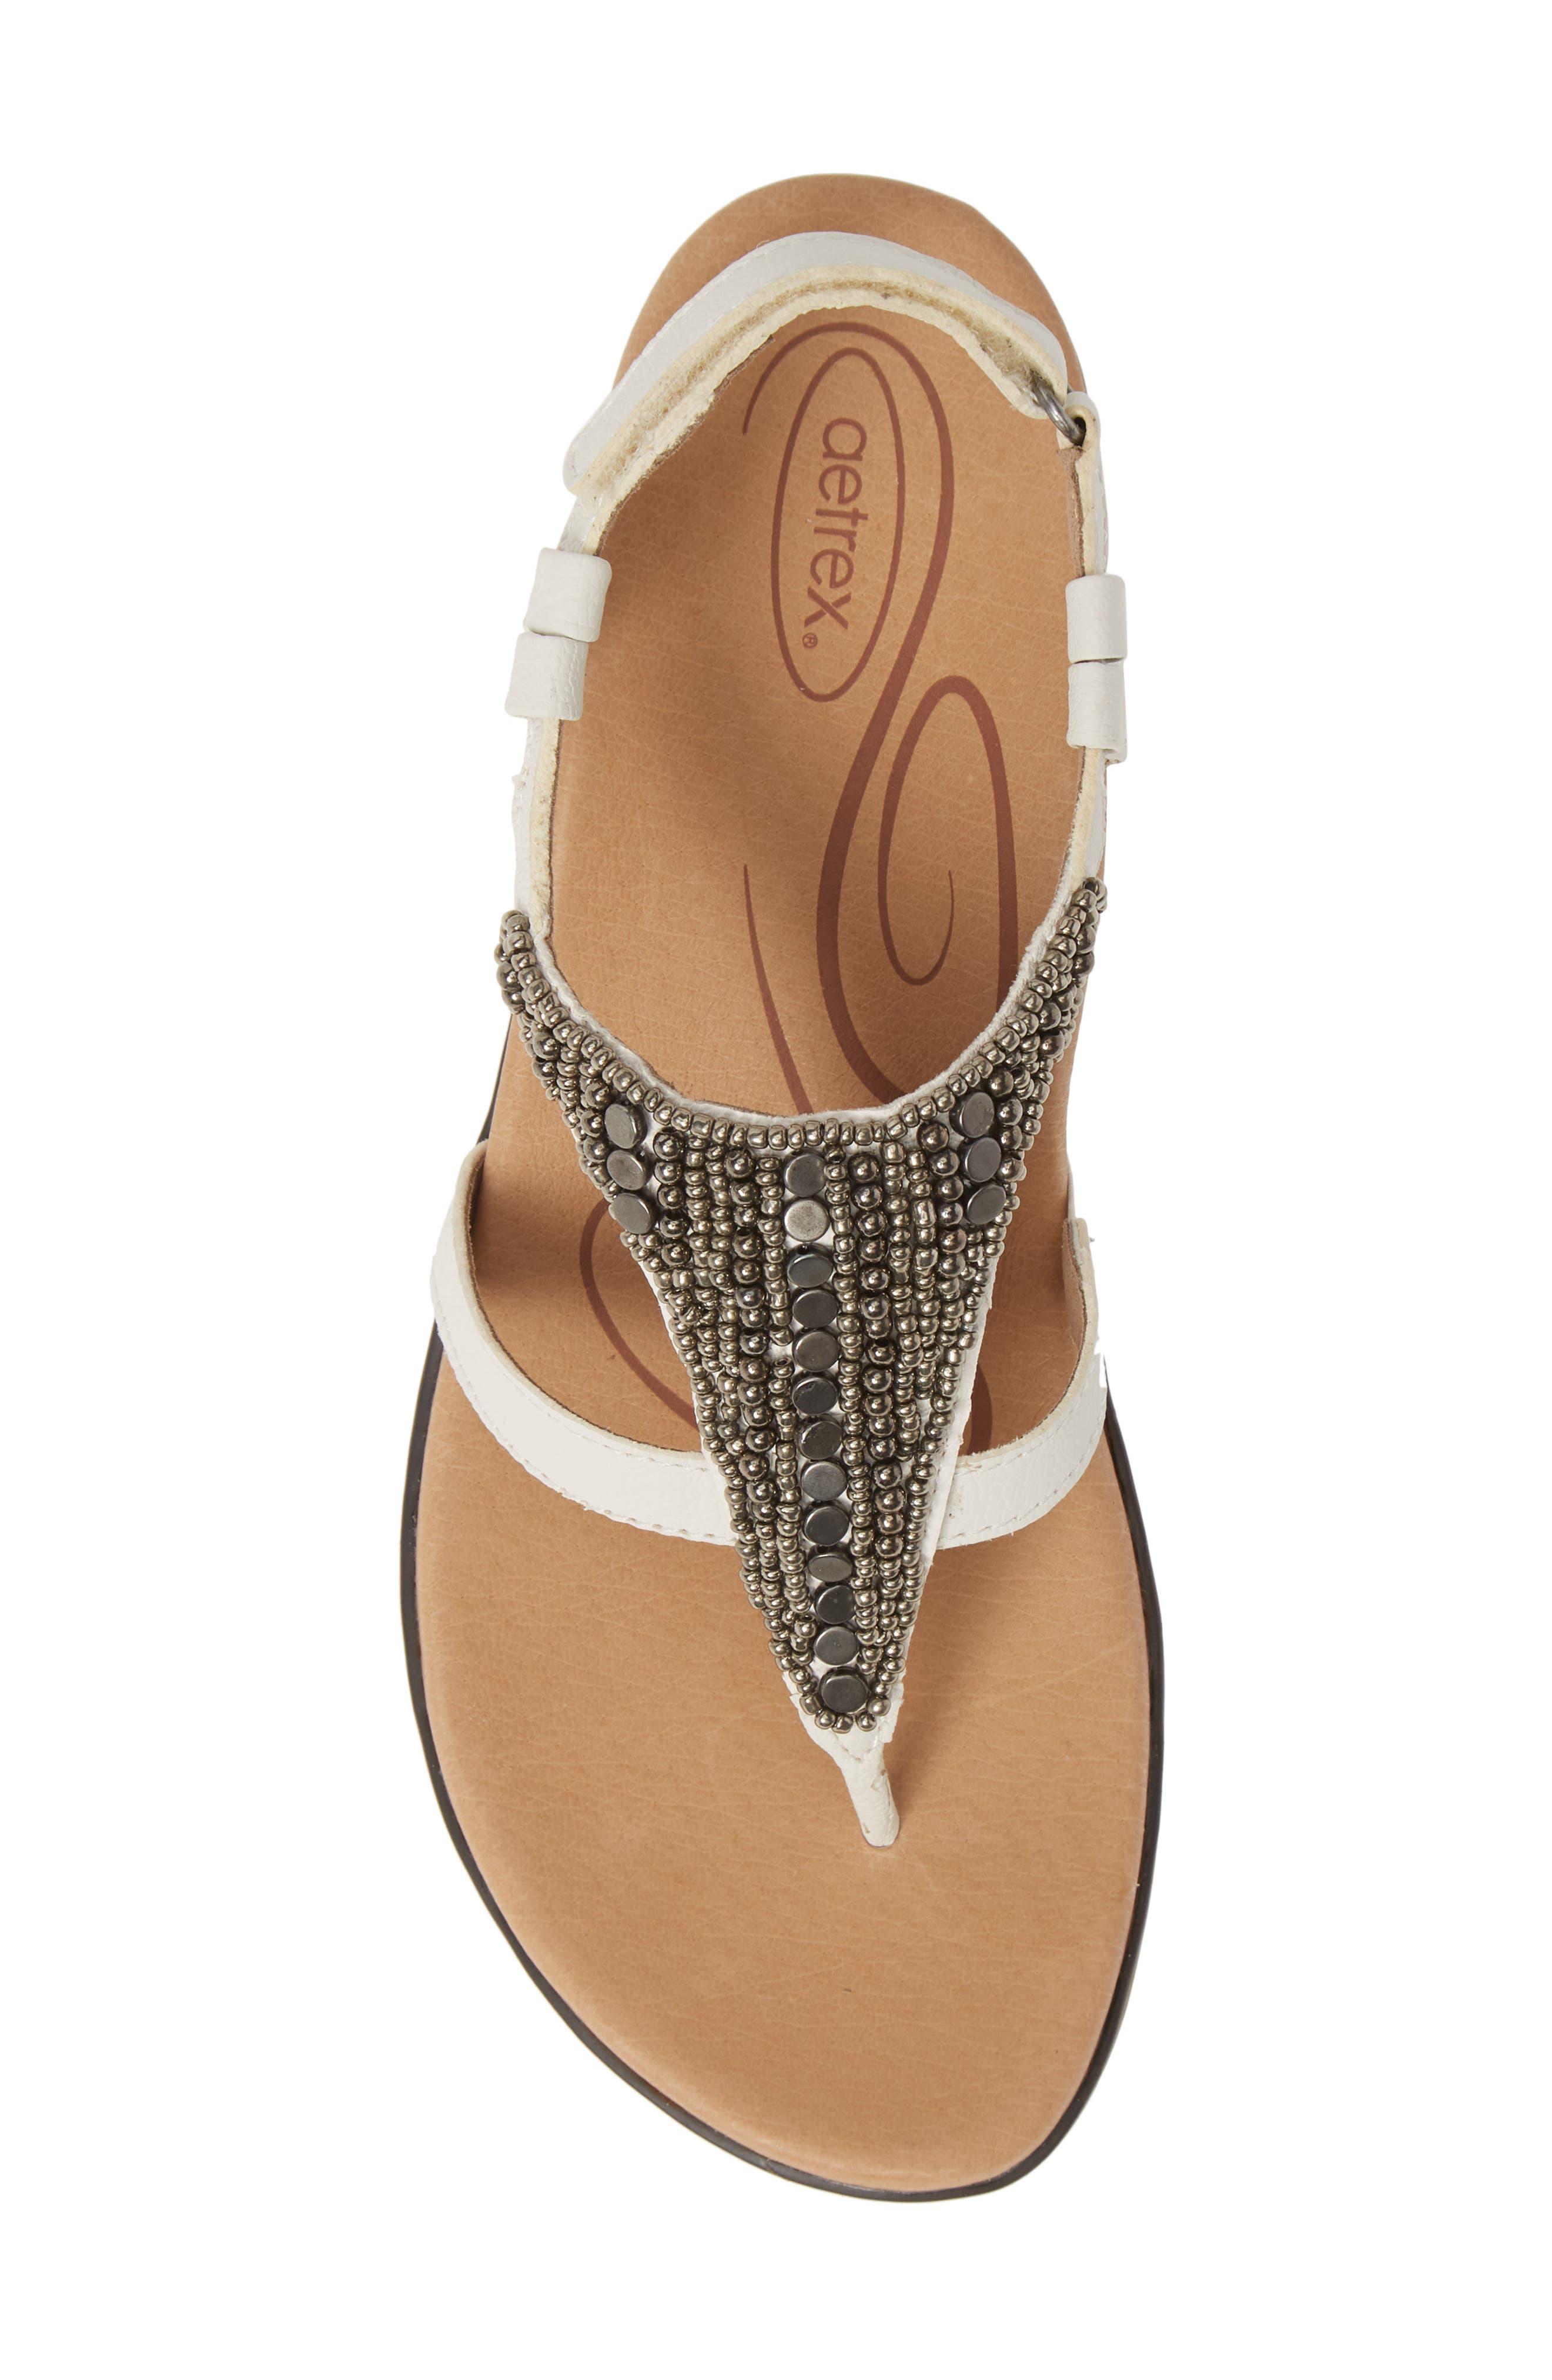 AETREX, Sheila Embellished Sandal, Alternate thumbnail 5, color, WHITE LEATHER